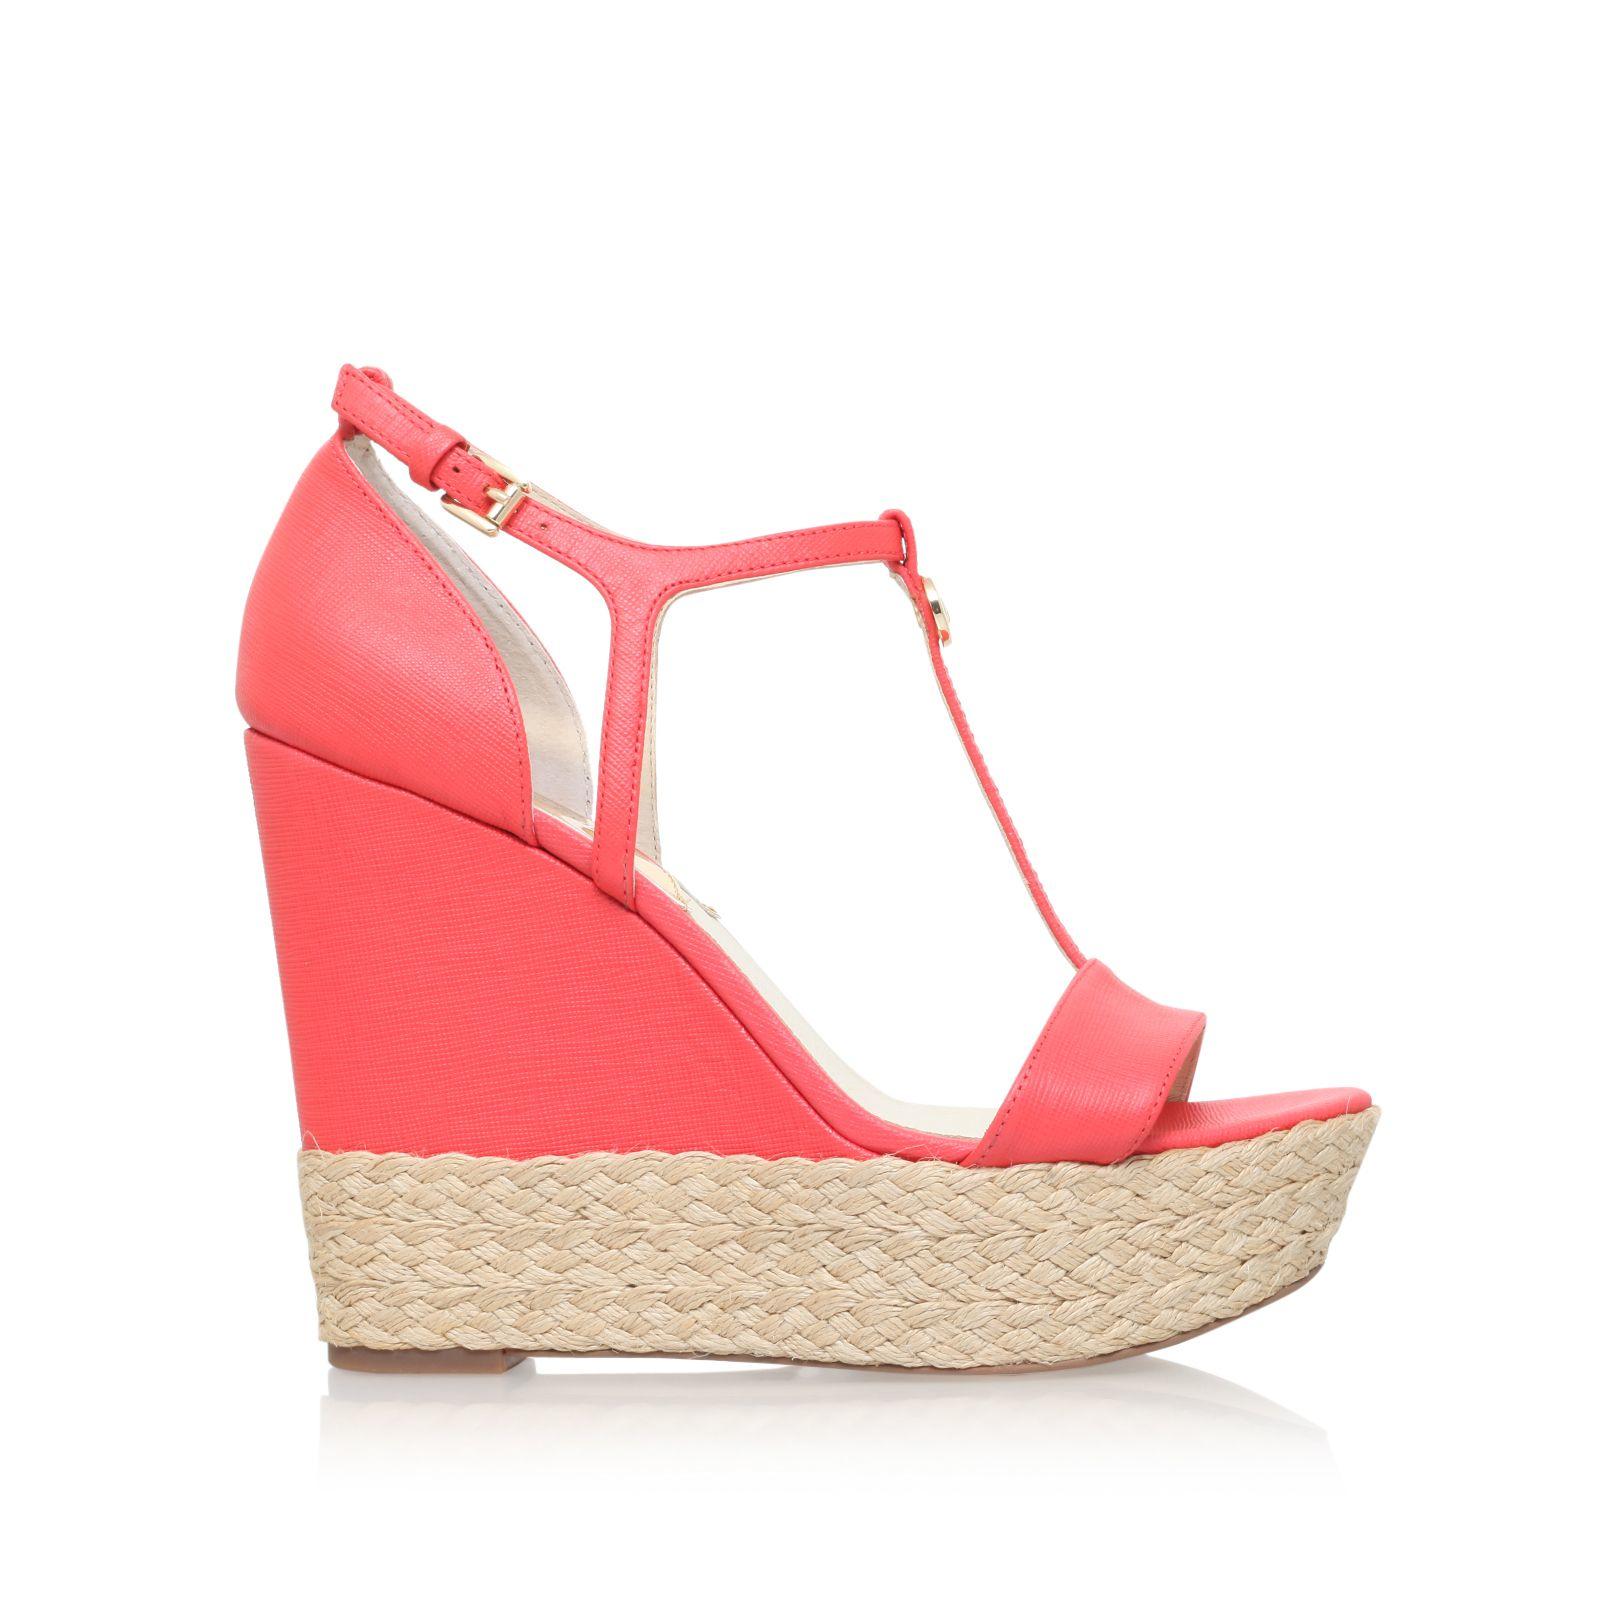 Salmon Pink High Heels